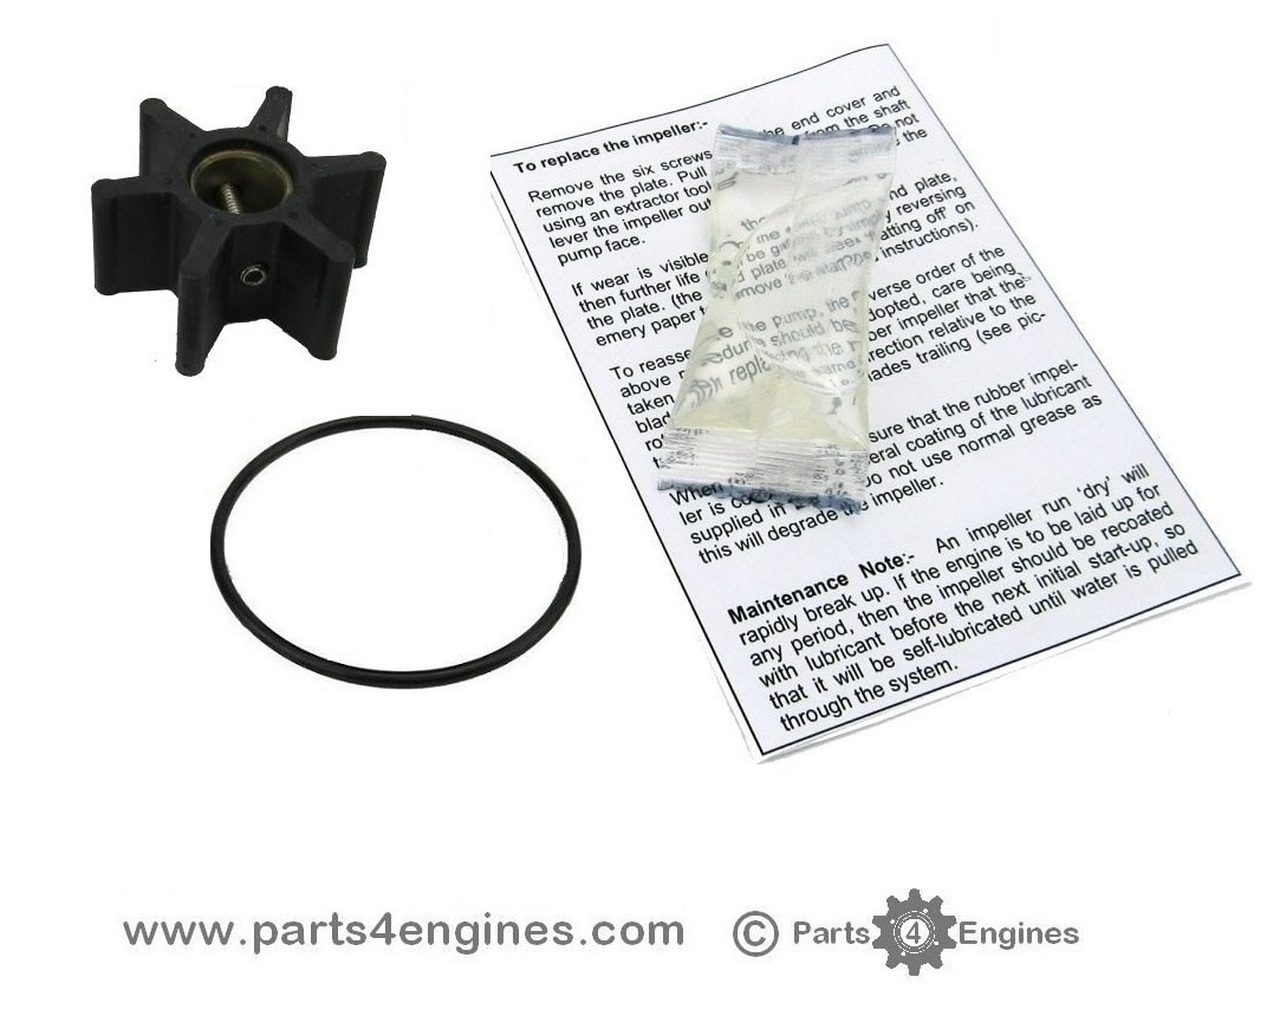 Yanmar 3YM30 Raw water pump impeller kit - parts4engines.com